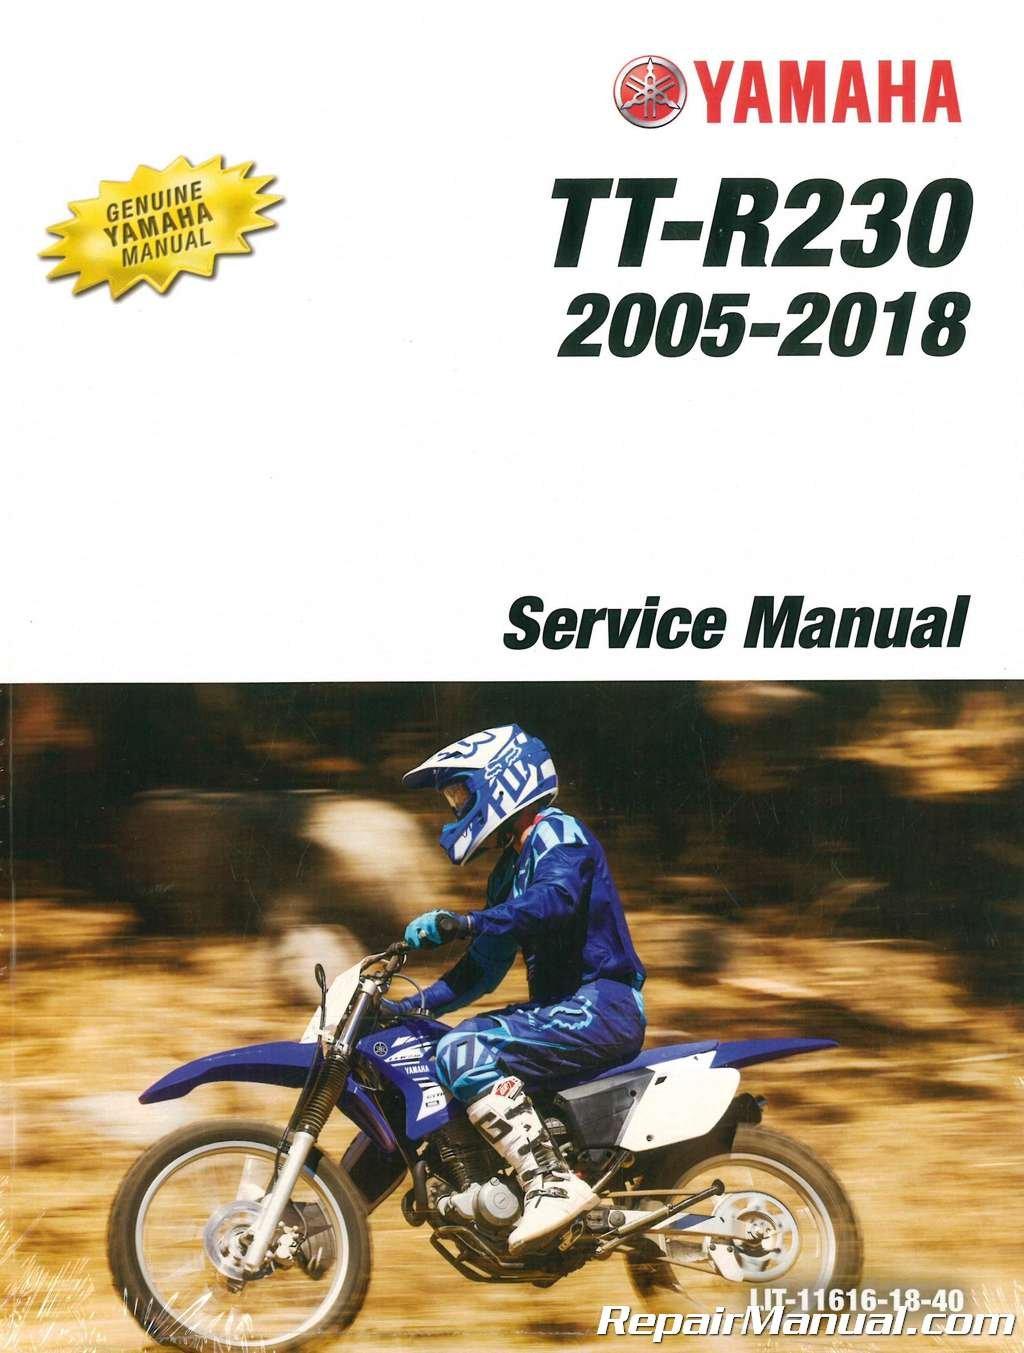 LIT-11616-18-40 Yamaha TTR230 Motorcycle Service Manual 2005-2009 2011-2018  Paperback – 2004